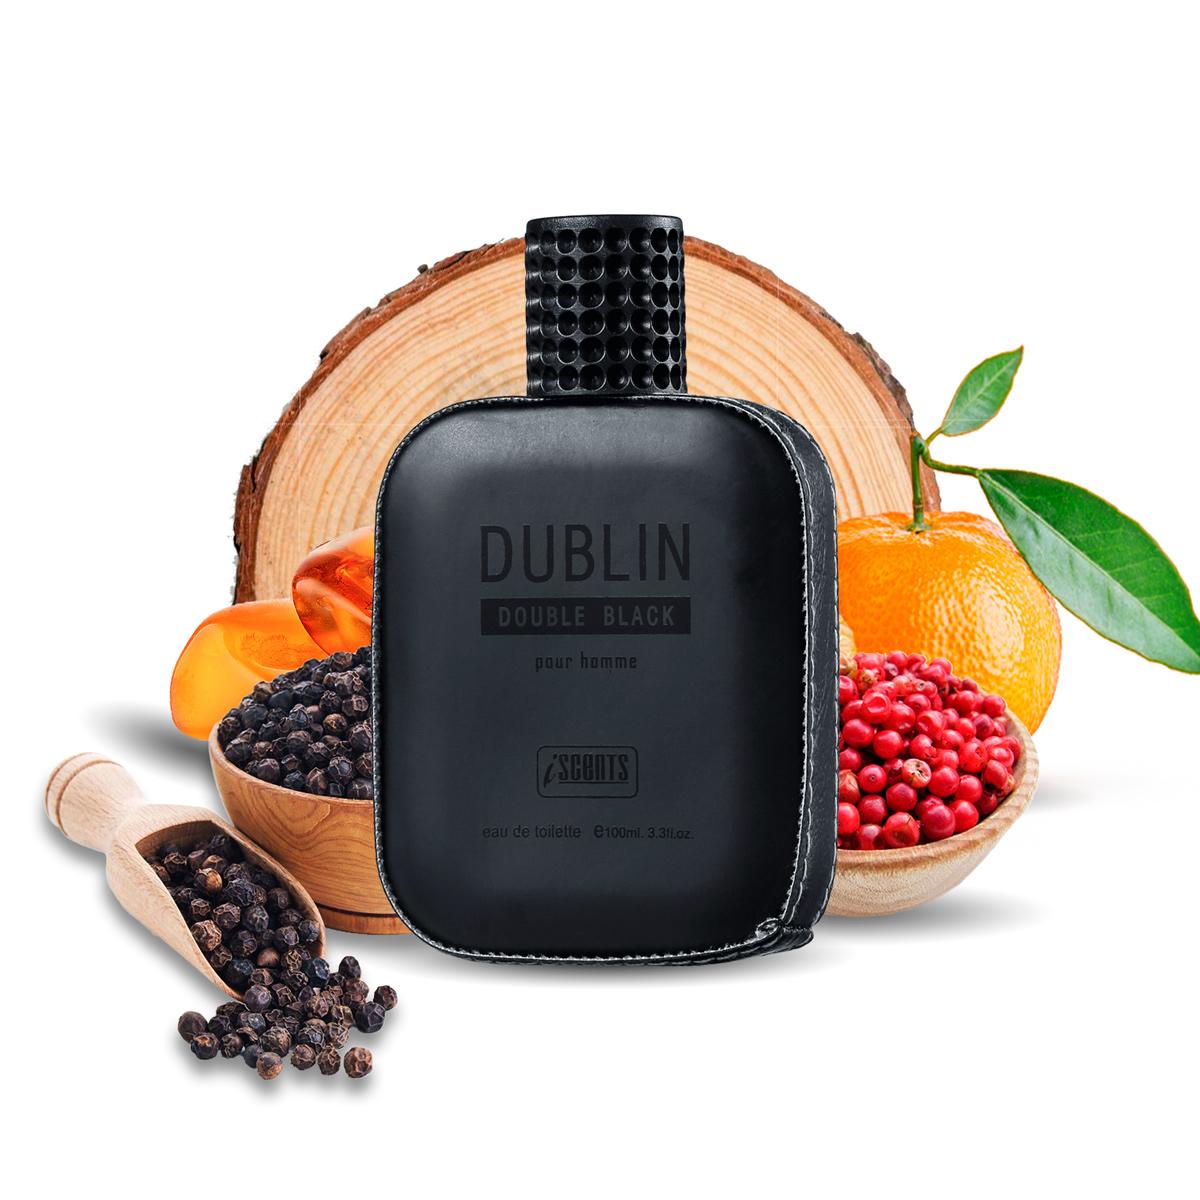 Kit 2 Perfumes Importados Excess e Dublin I Scents